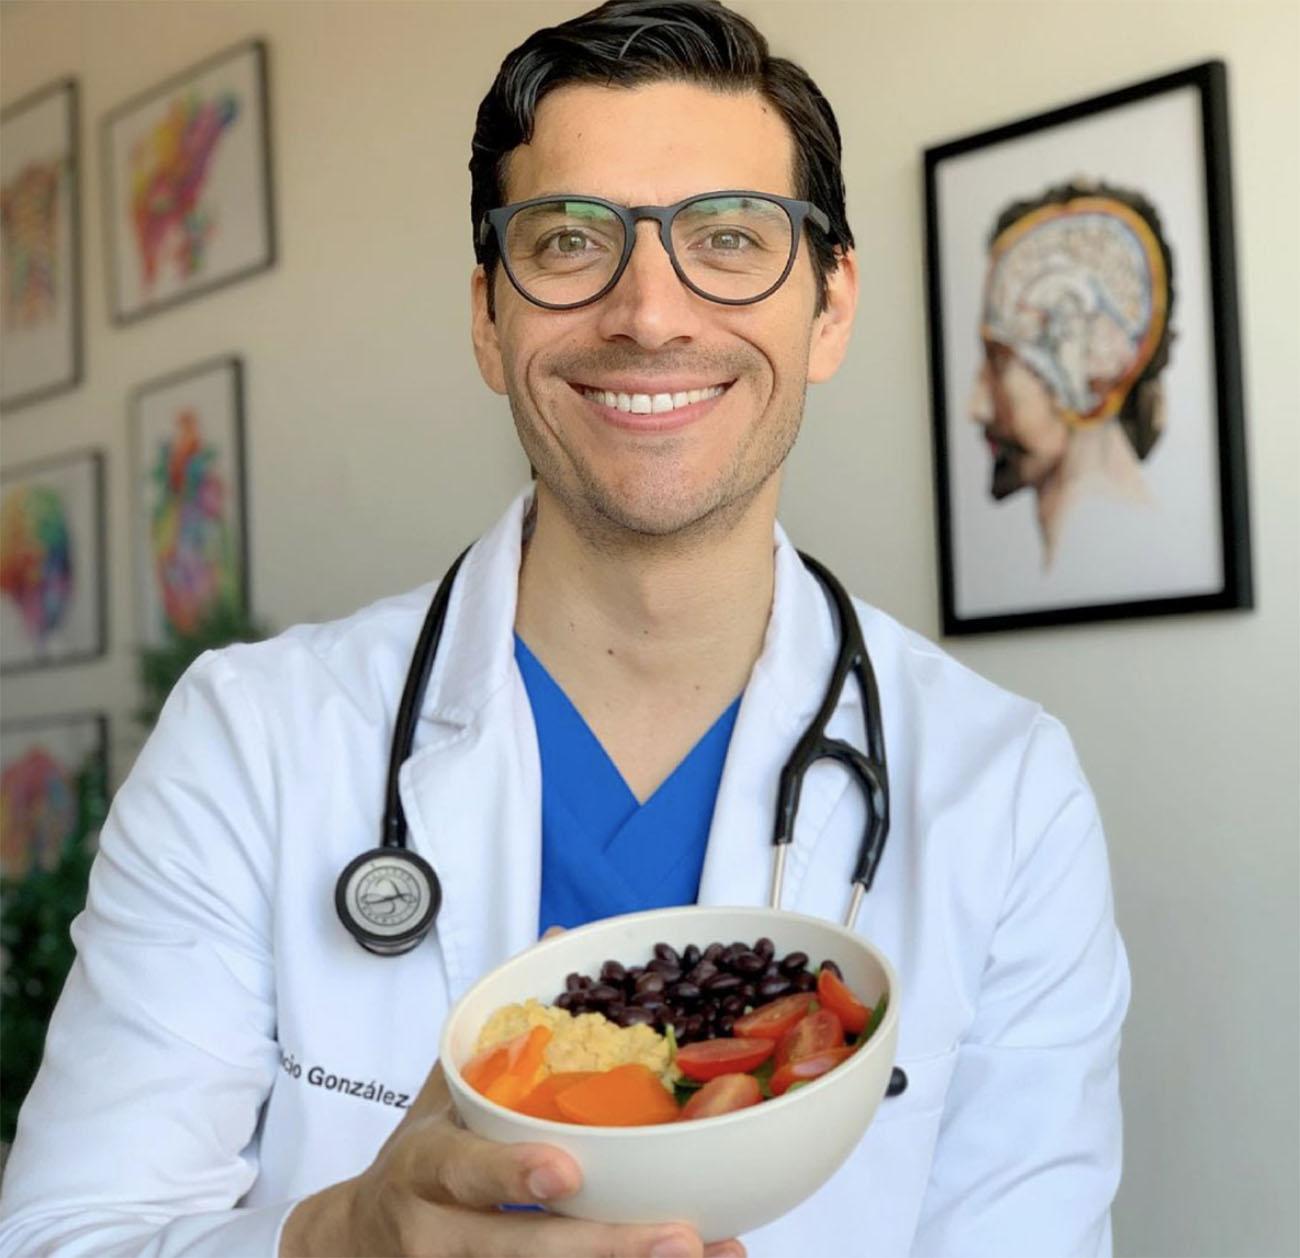 doctor mauricio gonzález